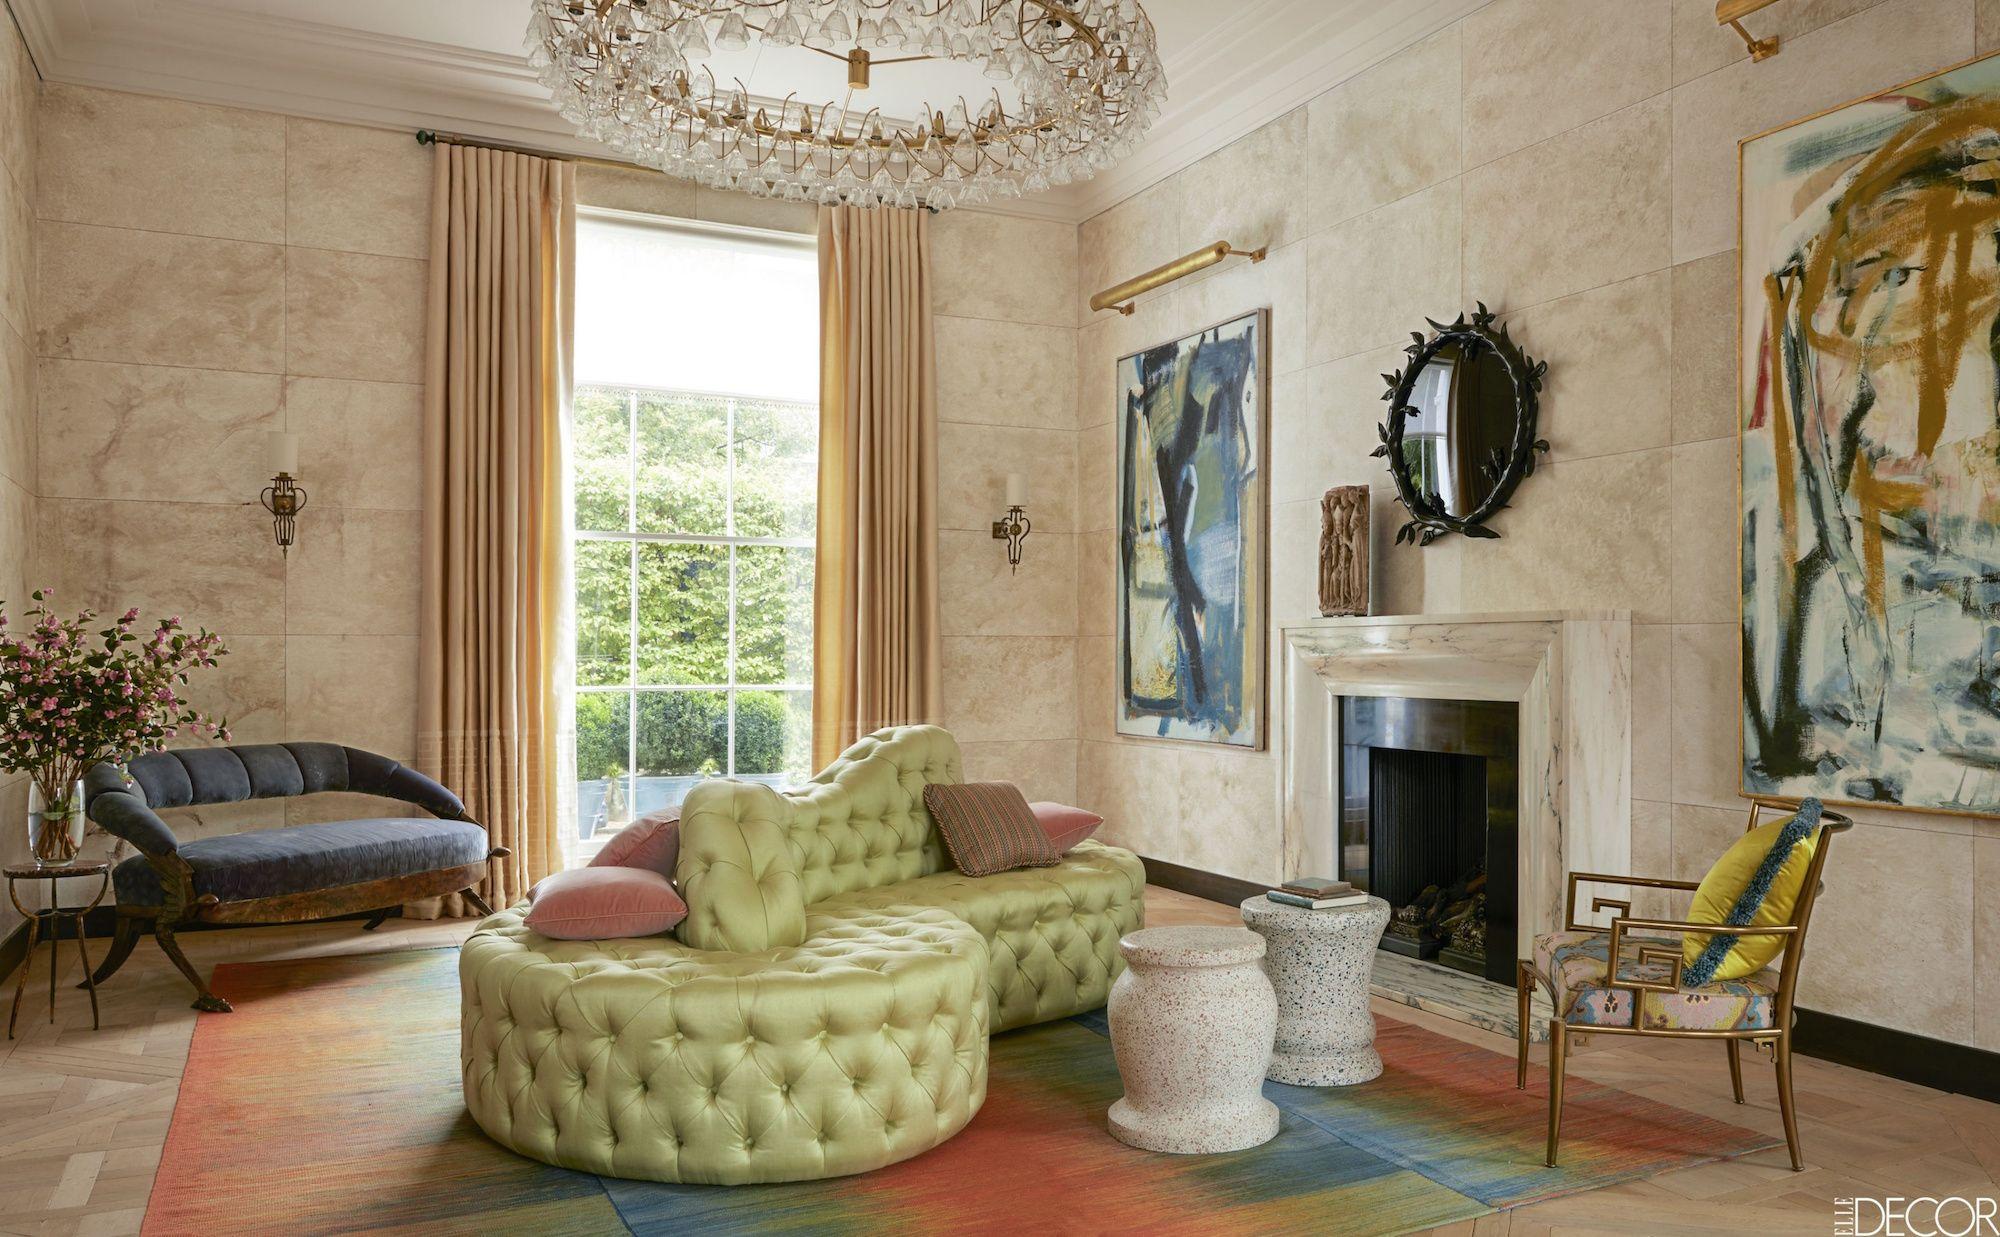 Curtain ideas for a small living room traininggreen